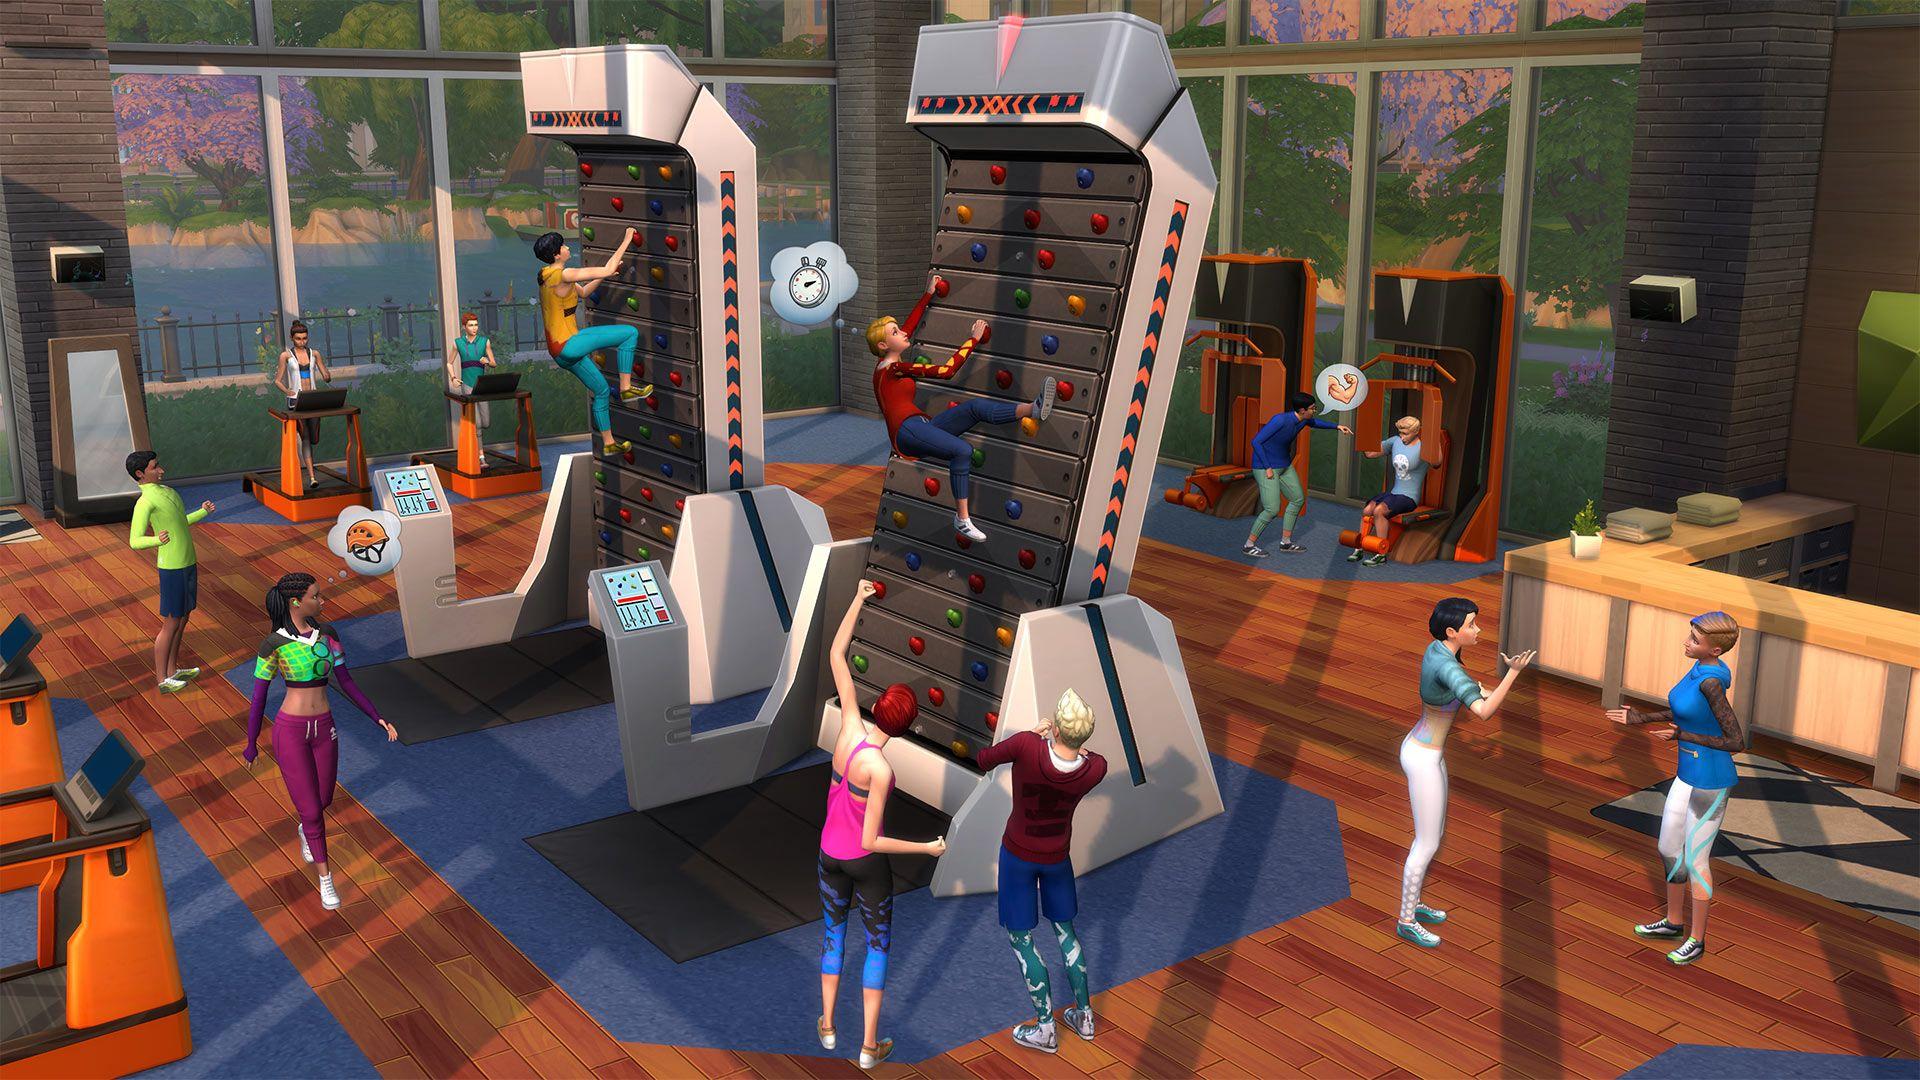 [Origin Access] Die Sims 4 - Fitness Accessoires DLC (PC Mac)